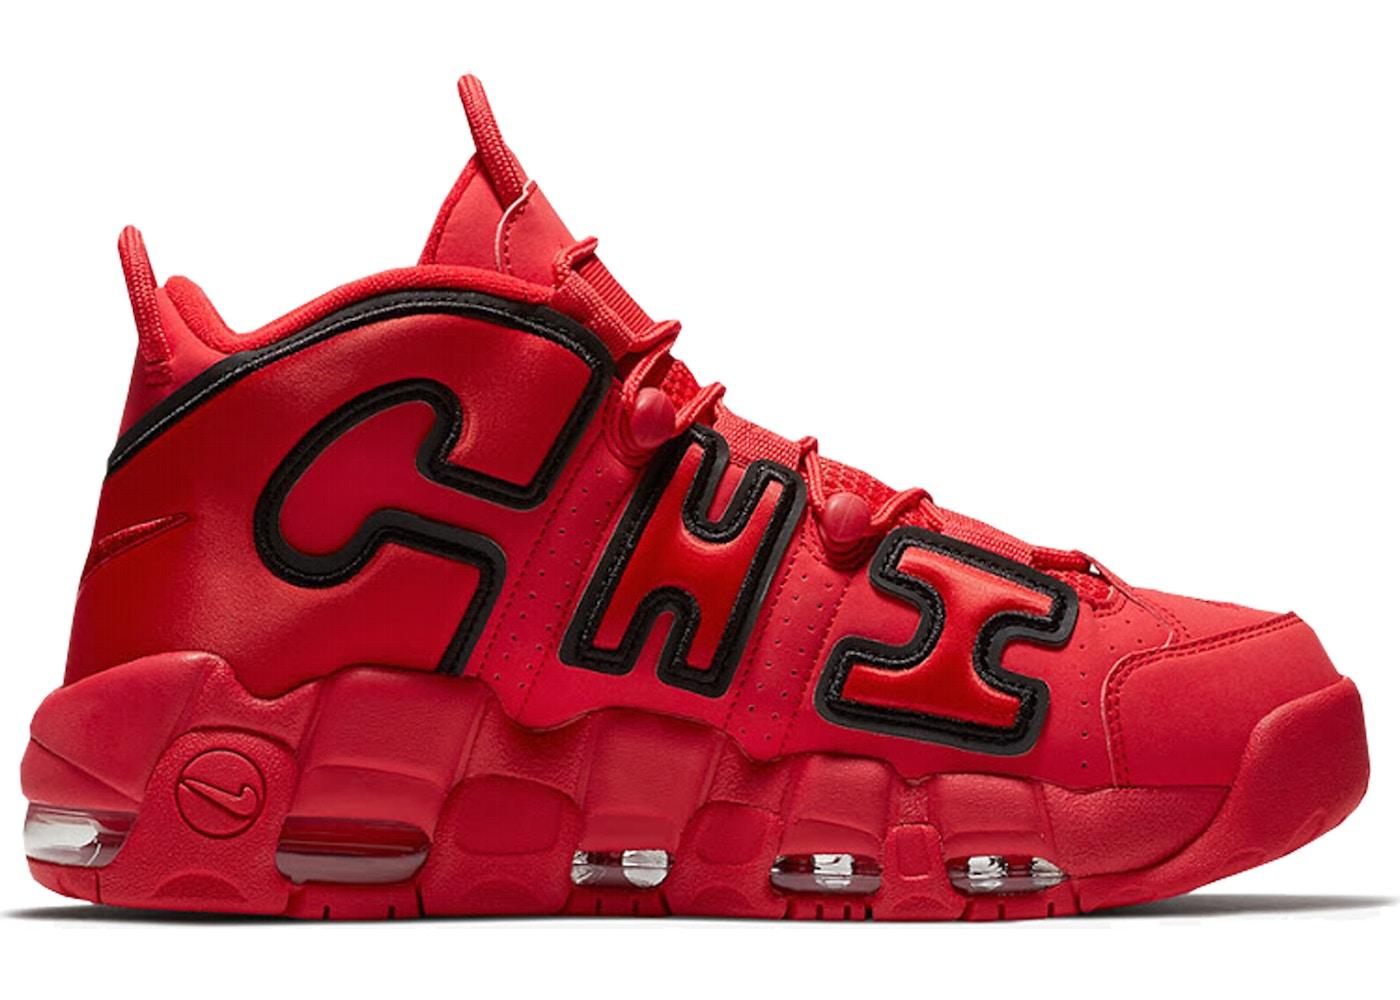 Nike Air More Utempo Chicago Bulls Edition | AIR | Adidas